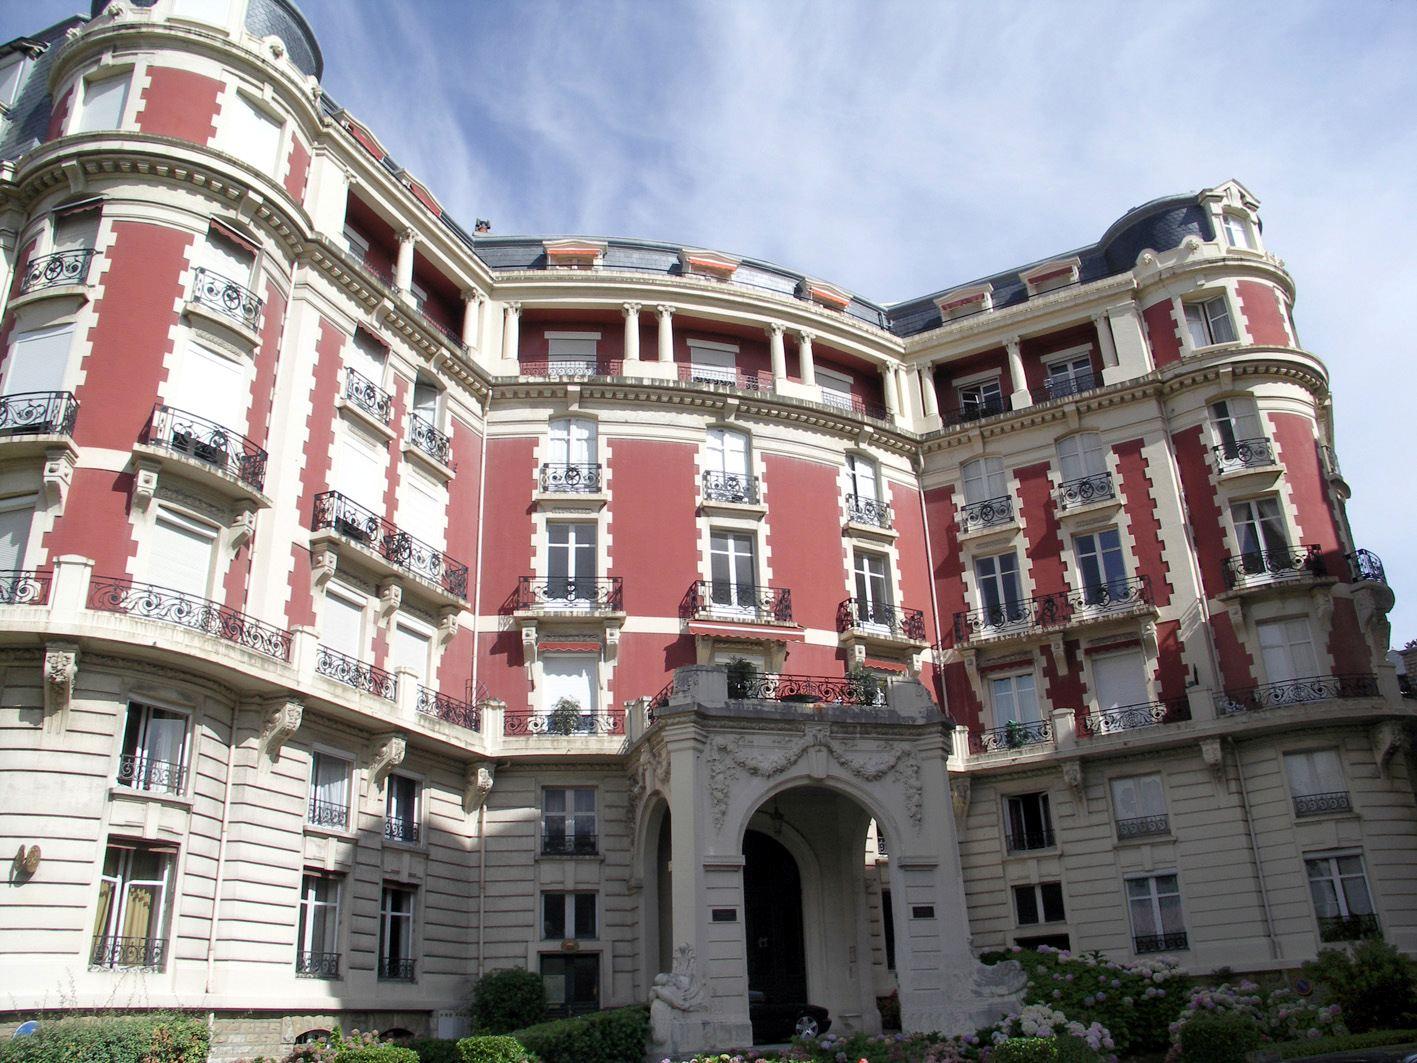 Appartamento per Vendita alle ore BIARRITZ QUARTIER IMPERIAL Biarritz, Aquitania, 64200 Francia